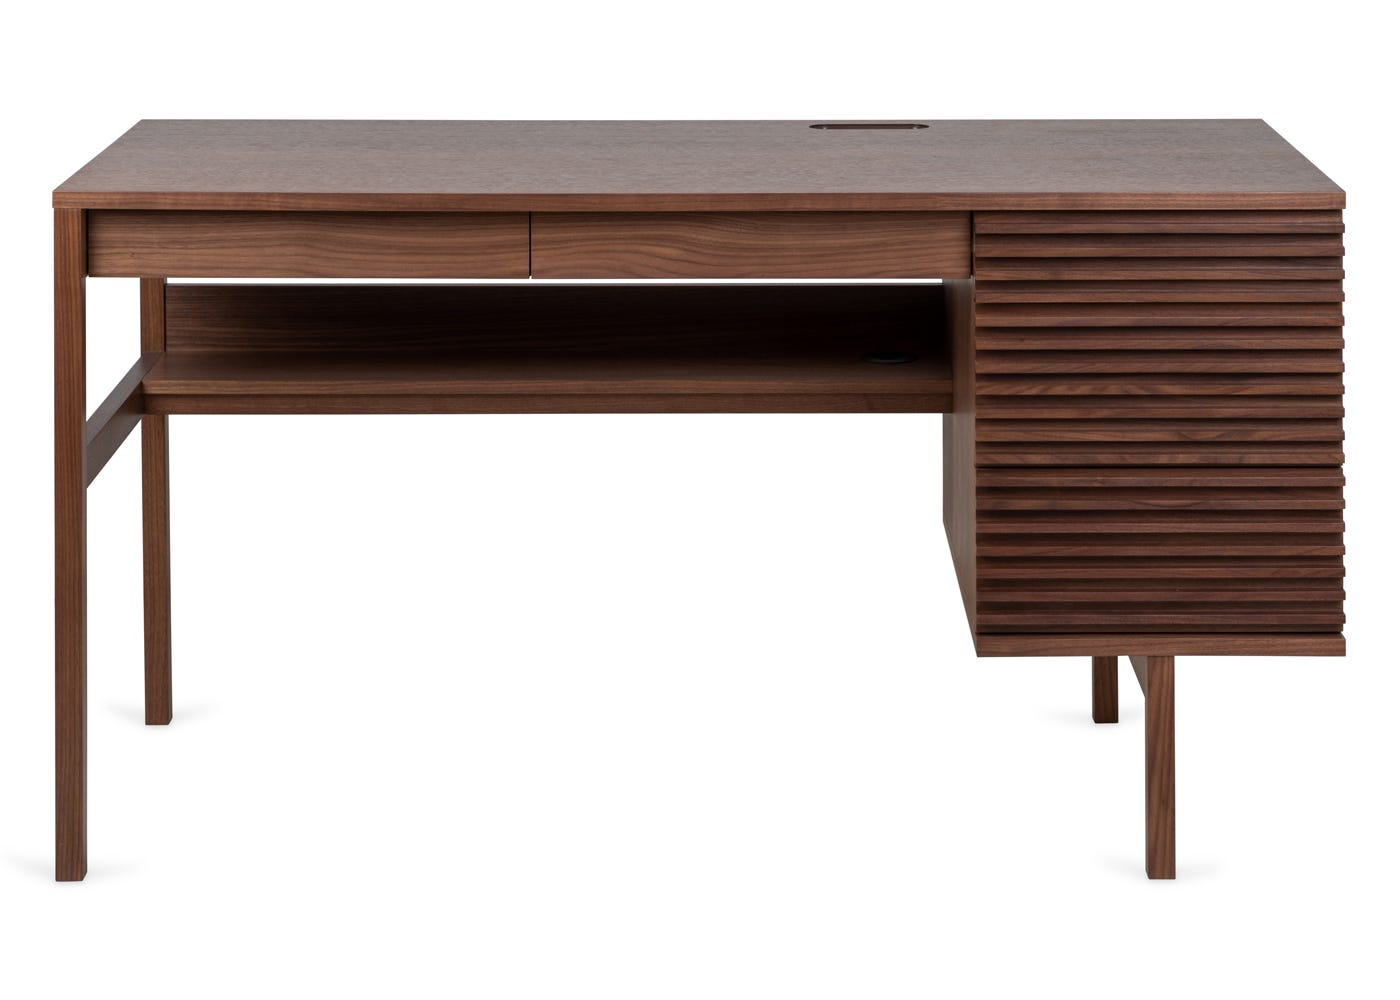 Verona desk in walnut - Front profile.